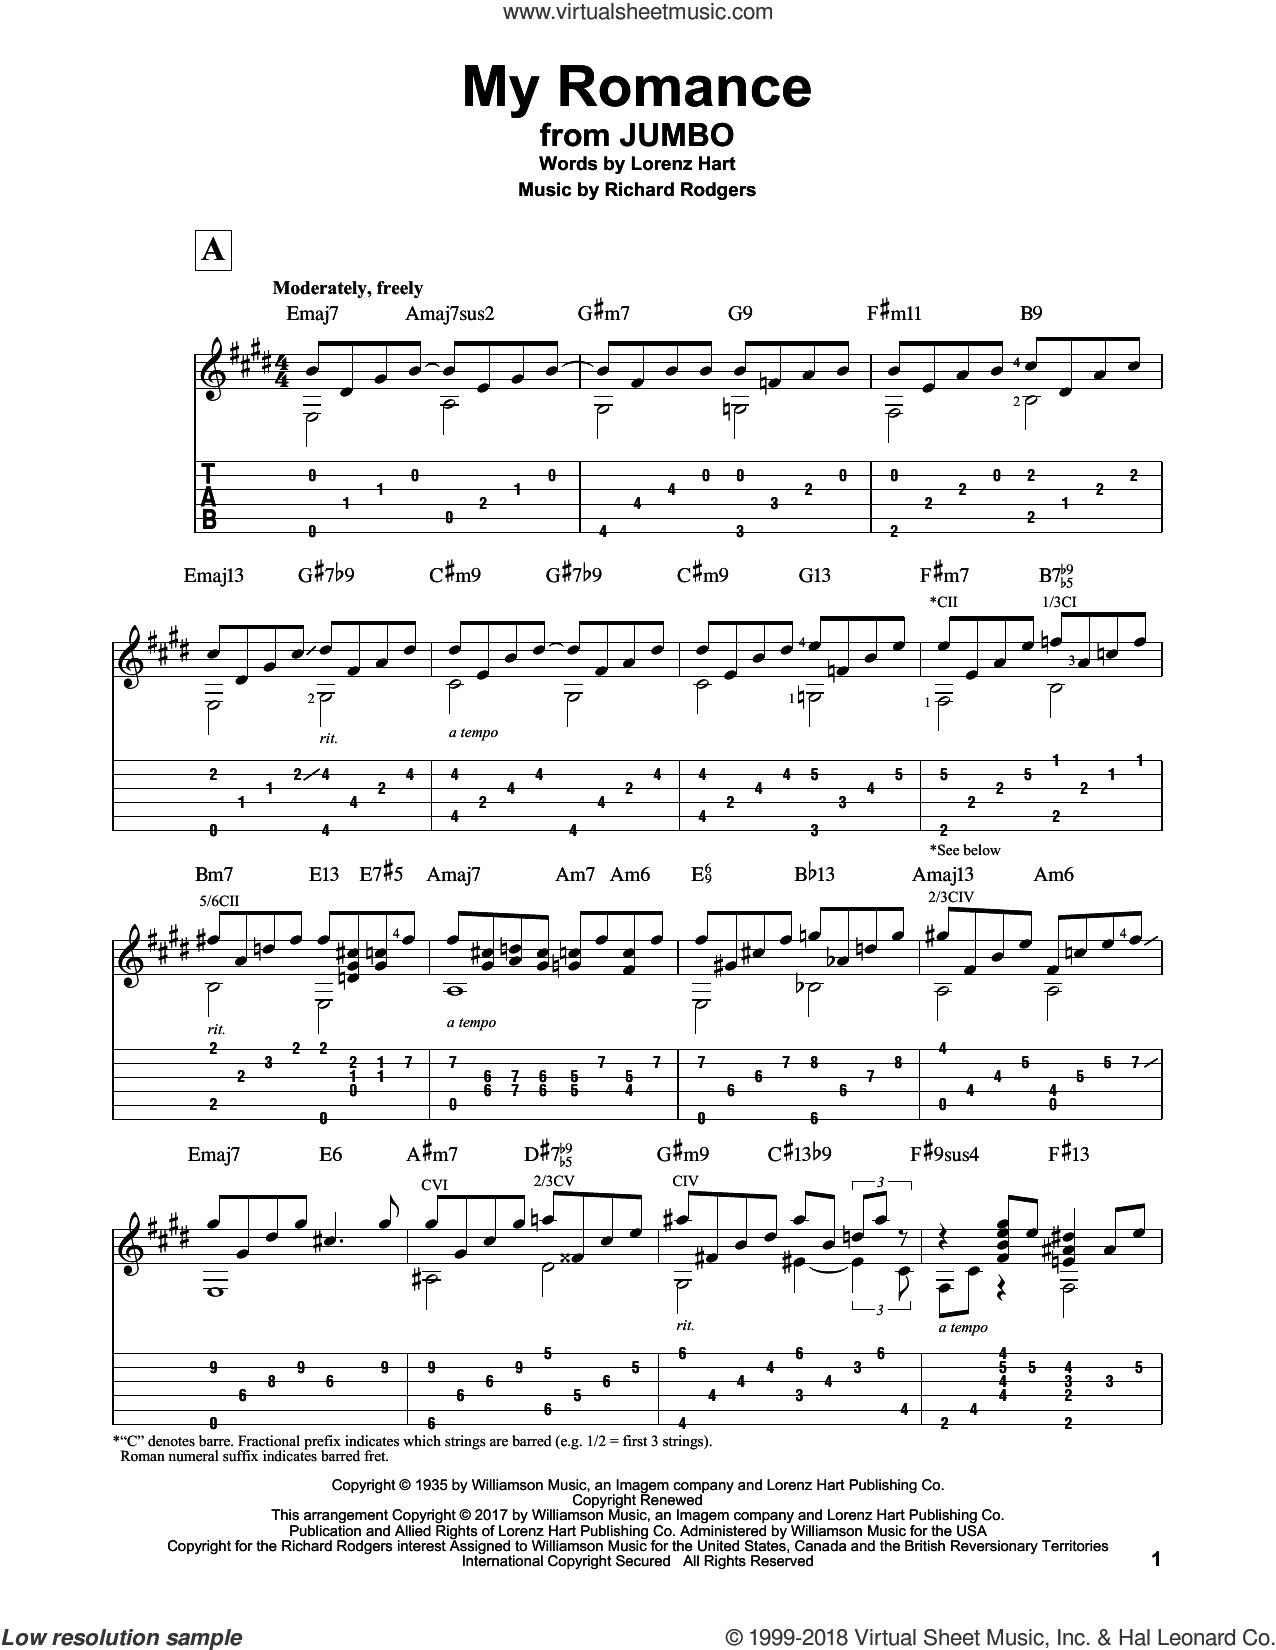 My Romance sheet music for guitar solo by Richard Rodgers, Matt Otten and Lorenz Hart, intermediate skill level